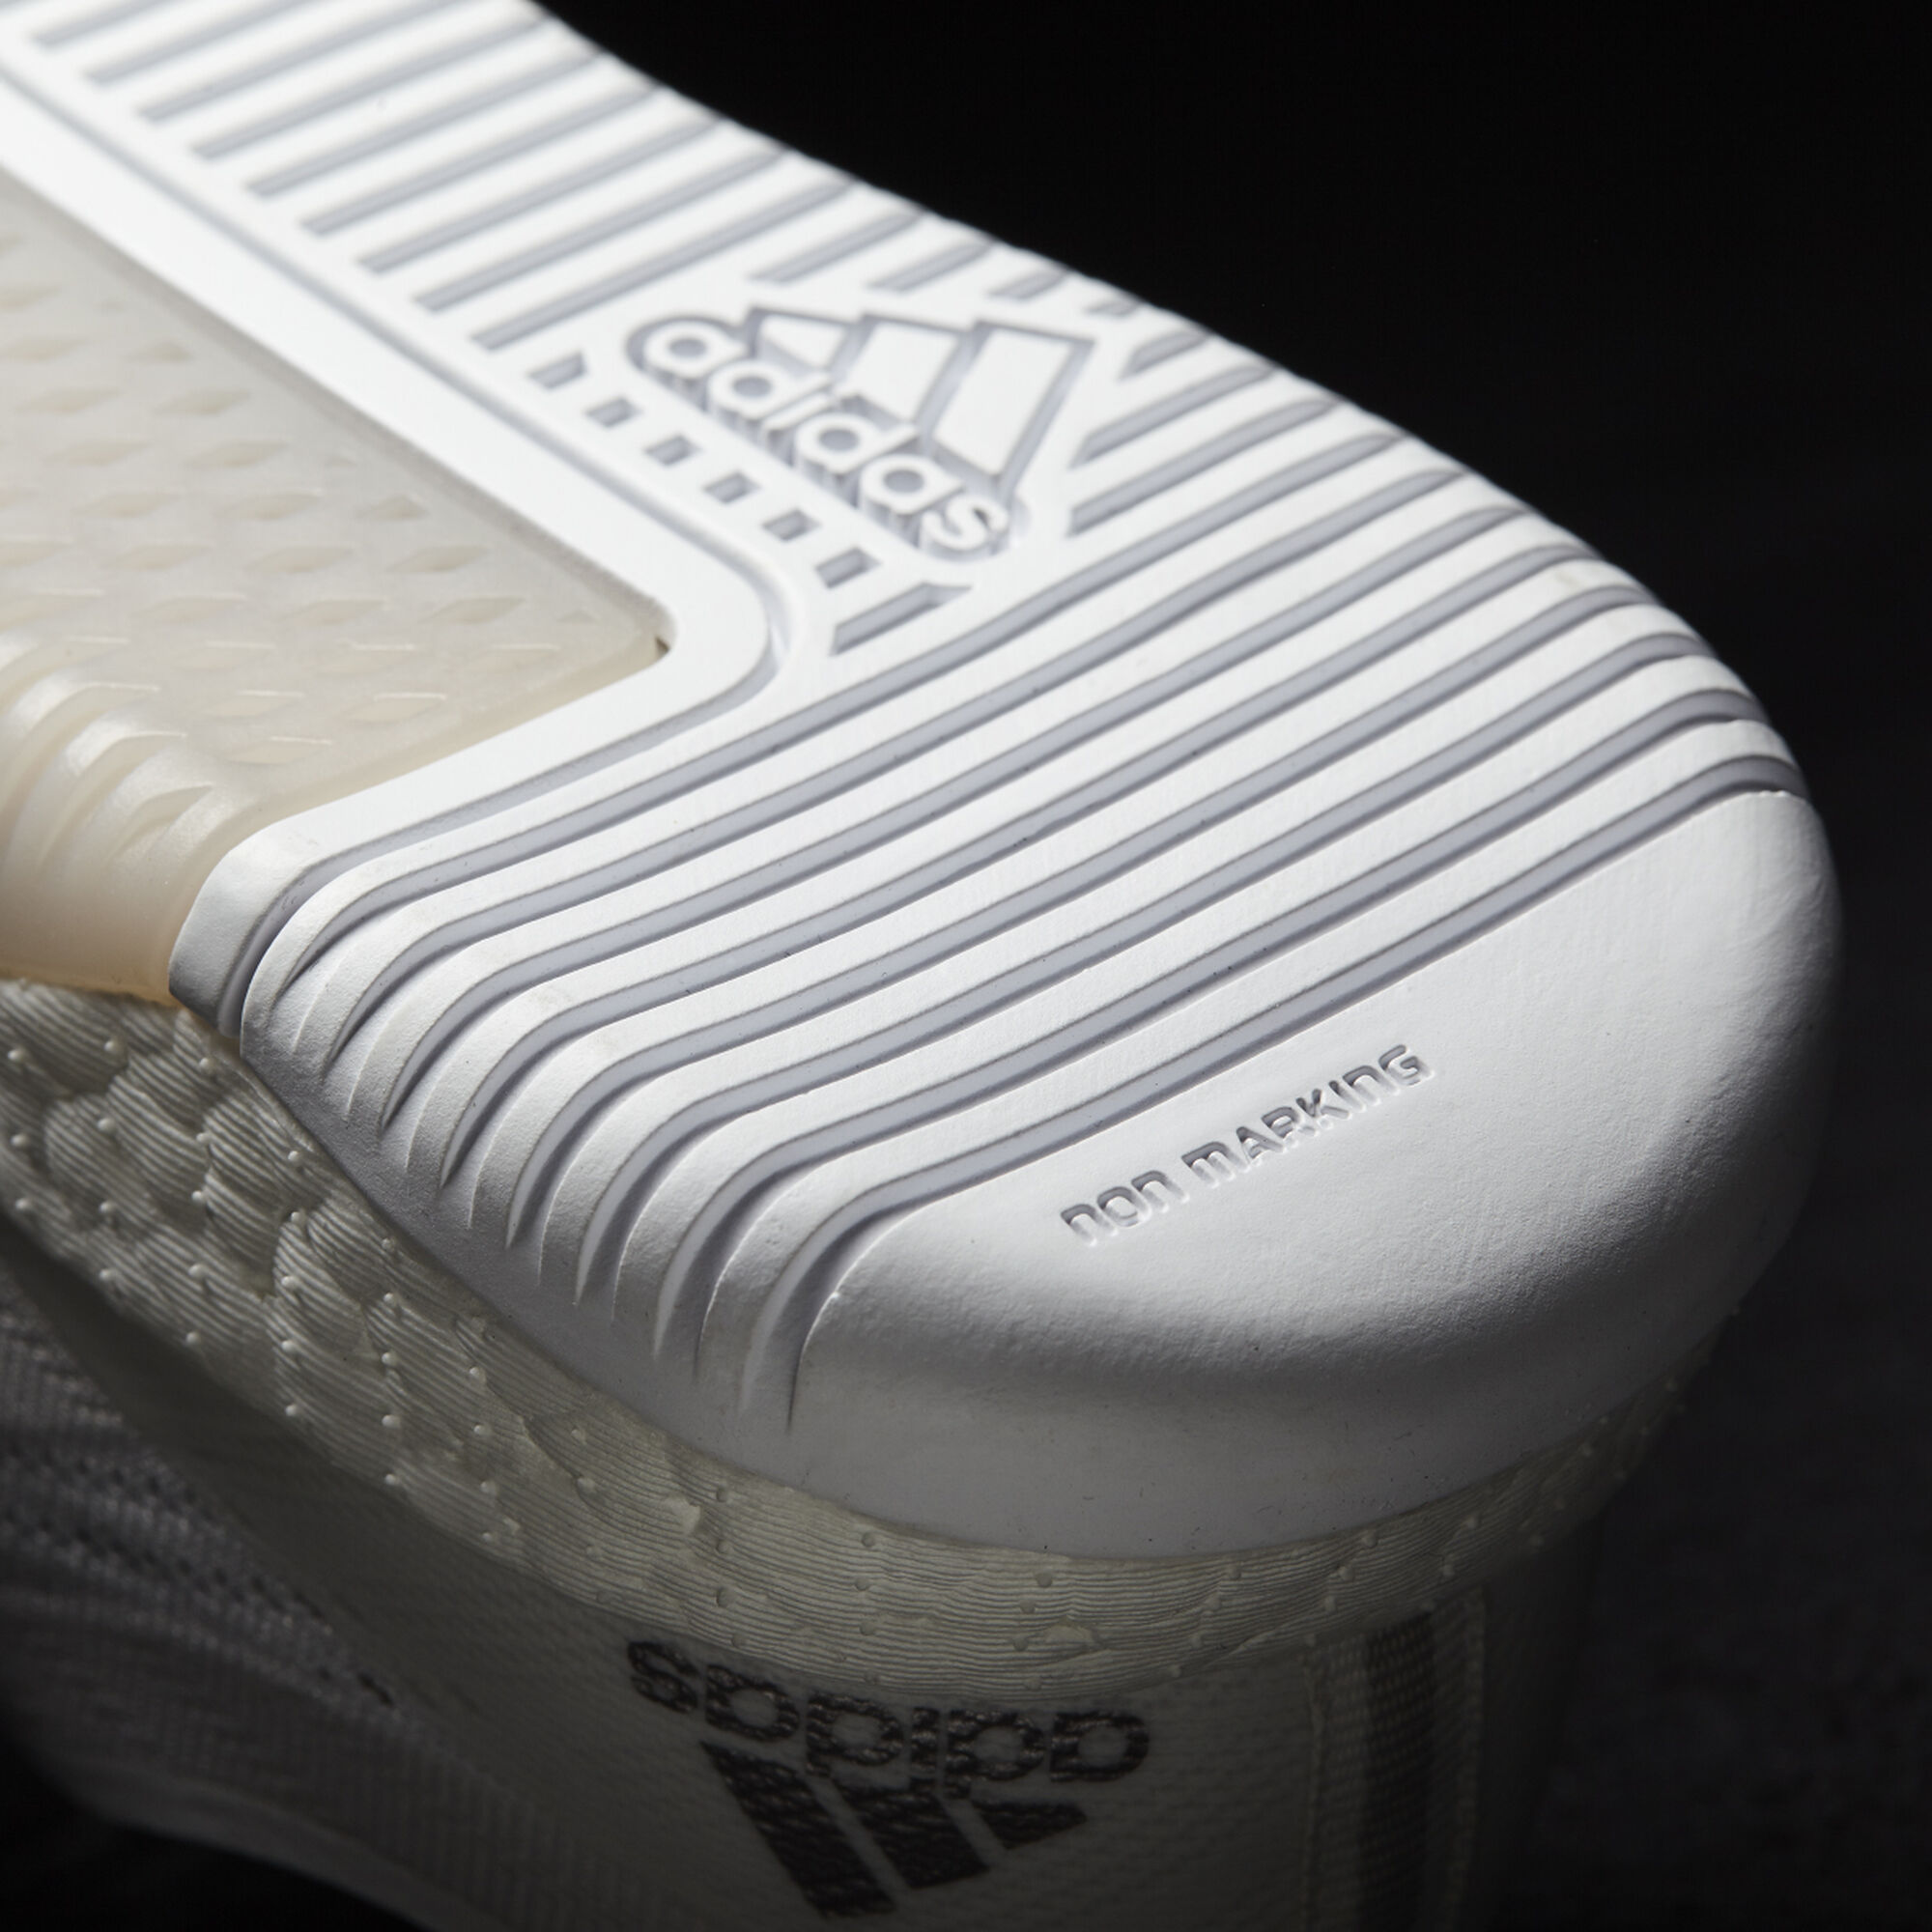 new photos bc55c a5be7 adidas · adidas · adidas · adidas · adidas · adidas · adidas · adidas ·  adidas. CrazyTrain Elite Women ...